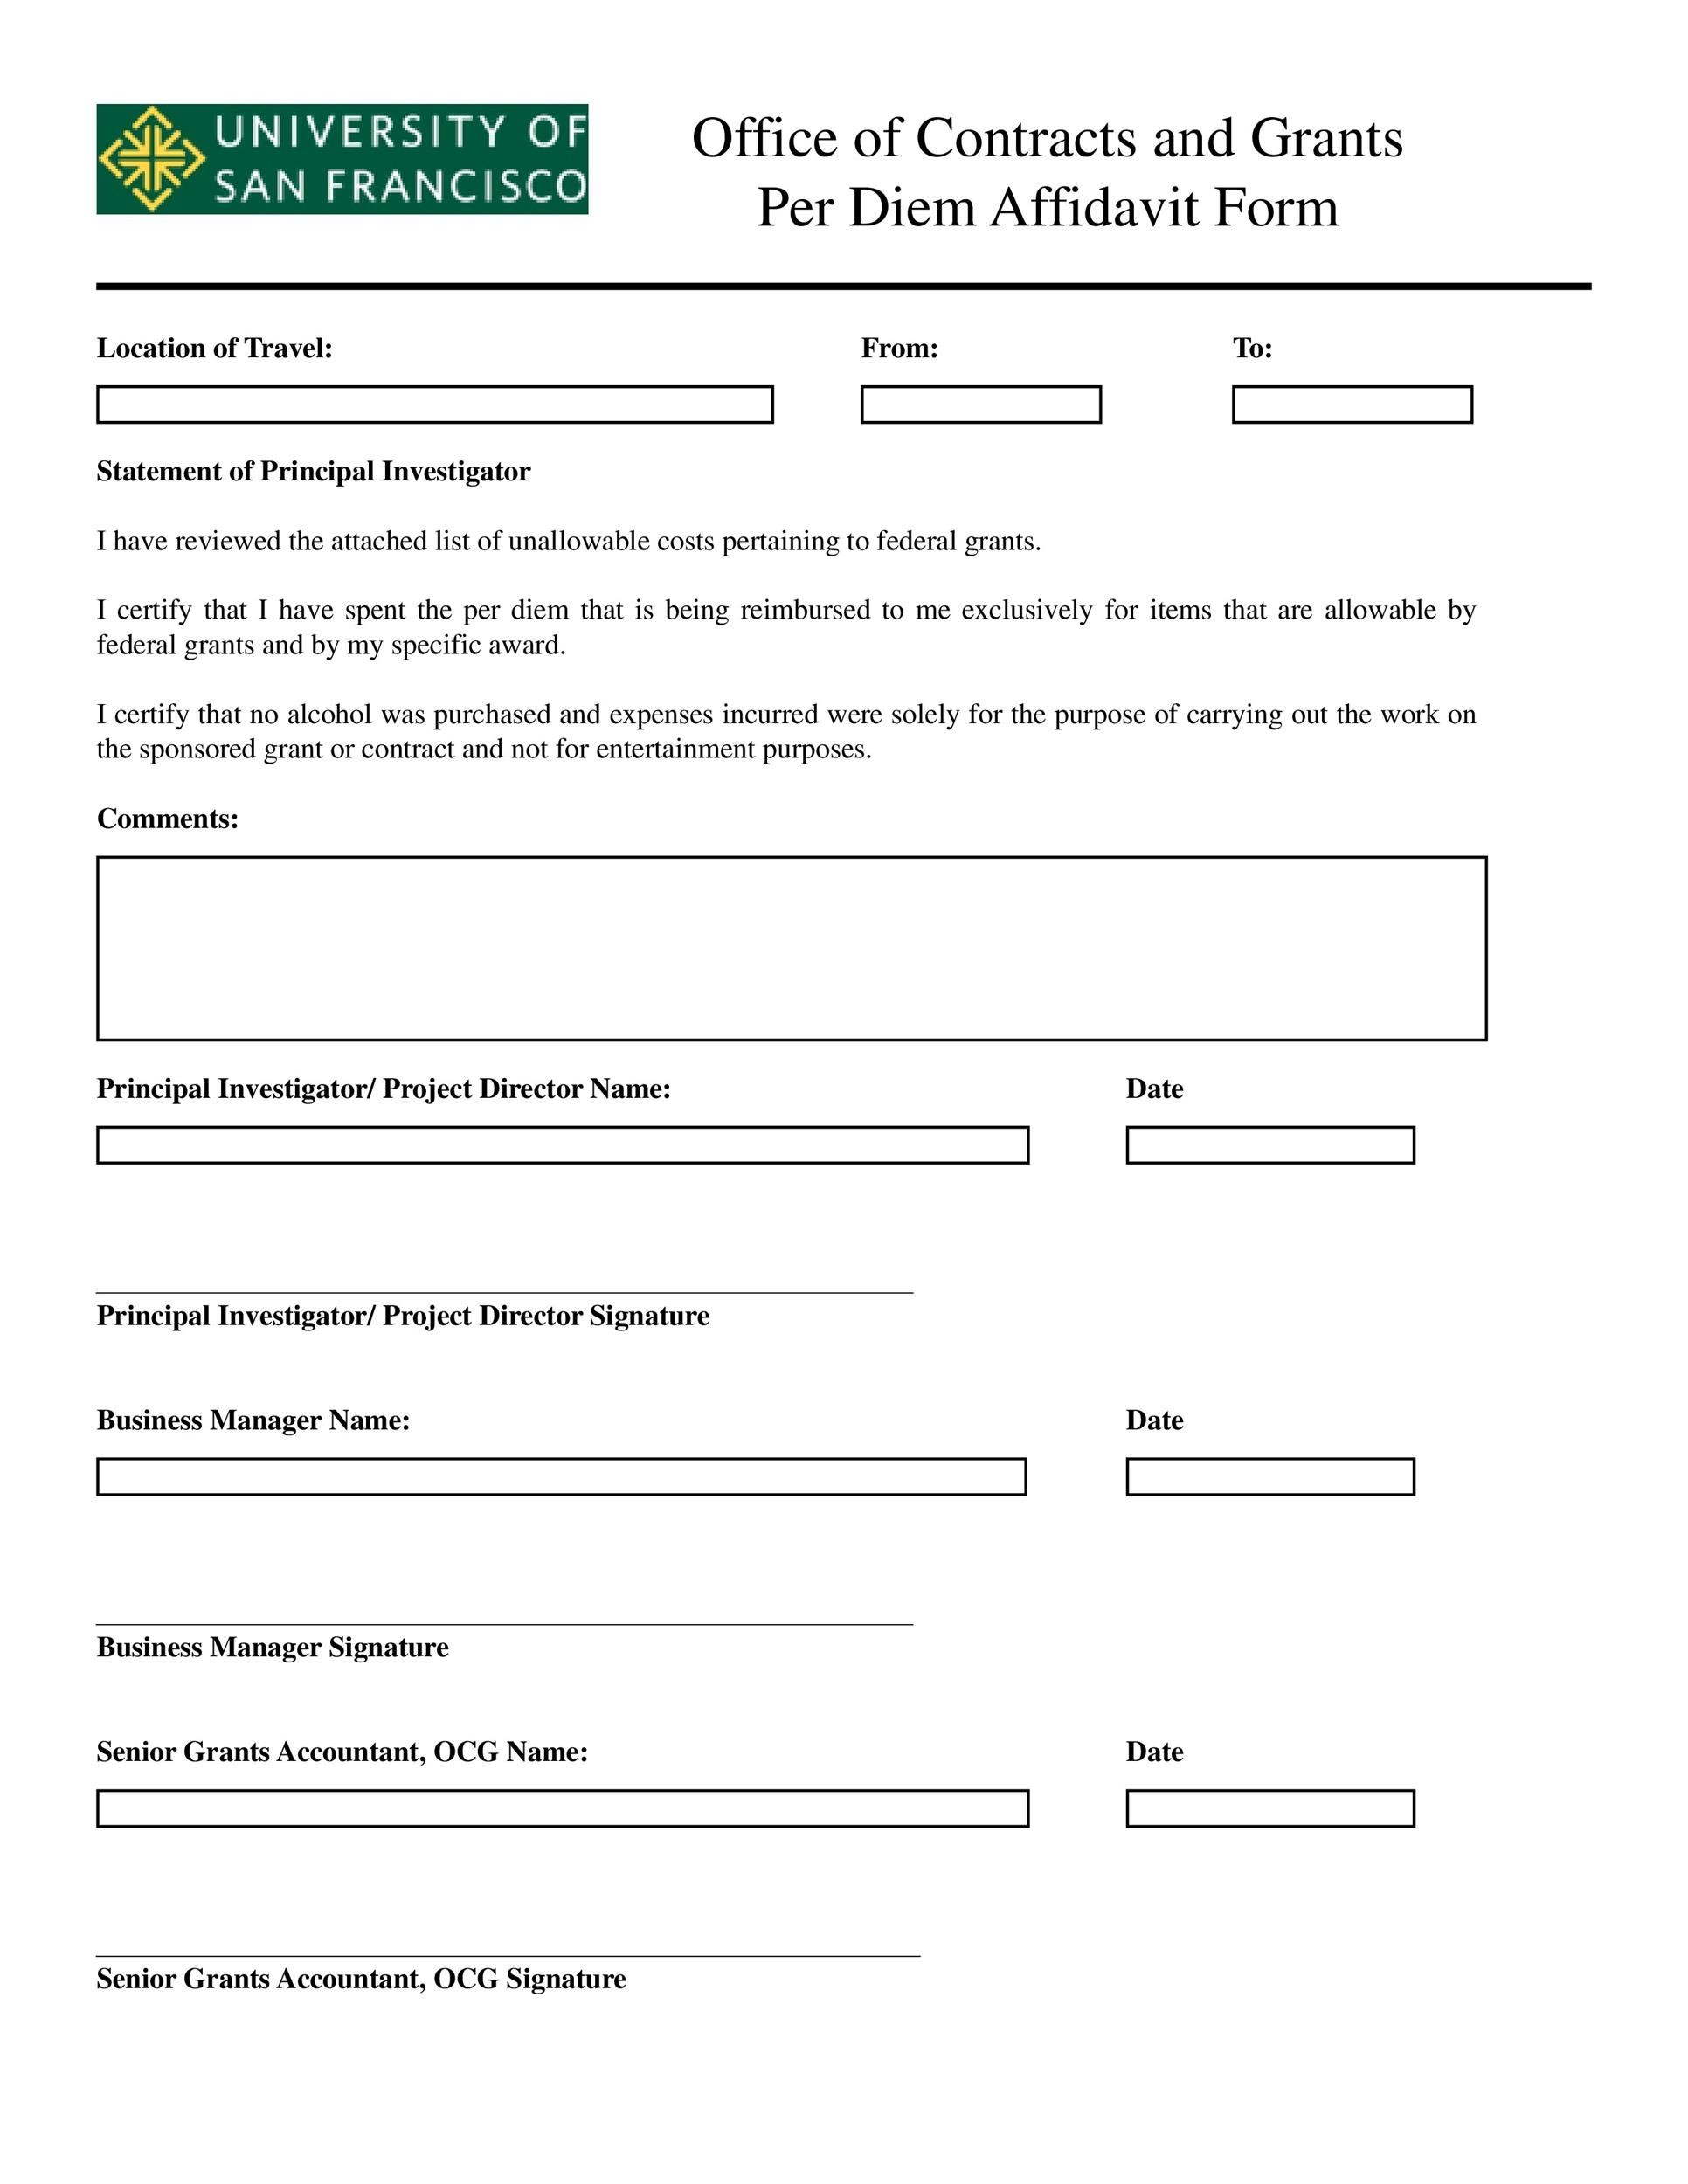 Free affidavit form 37